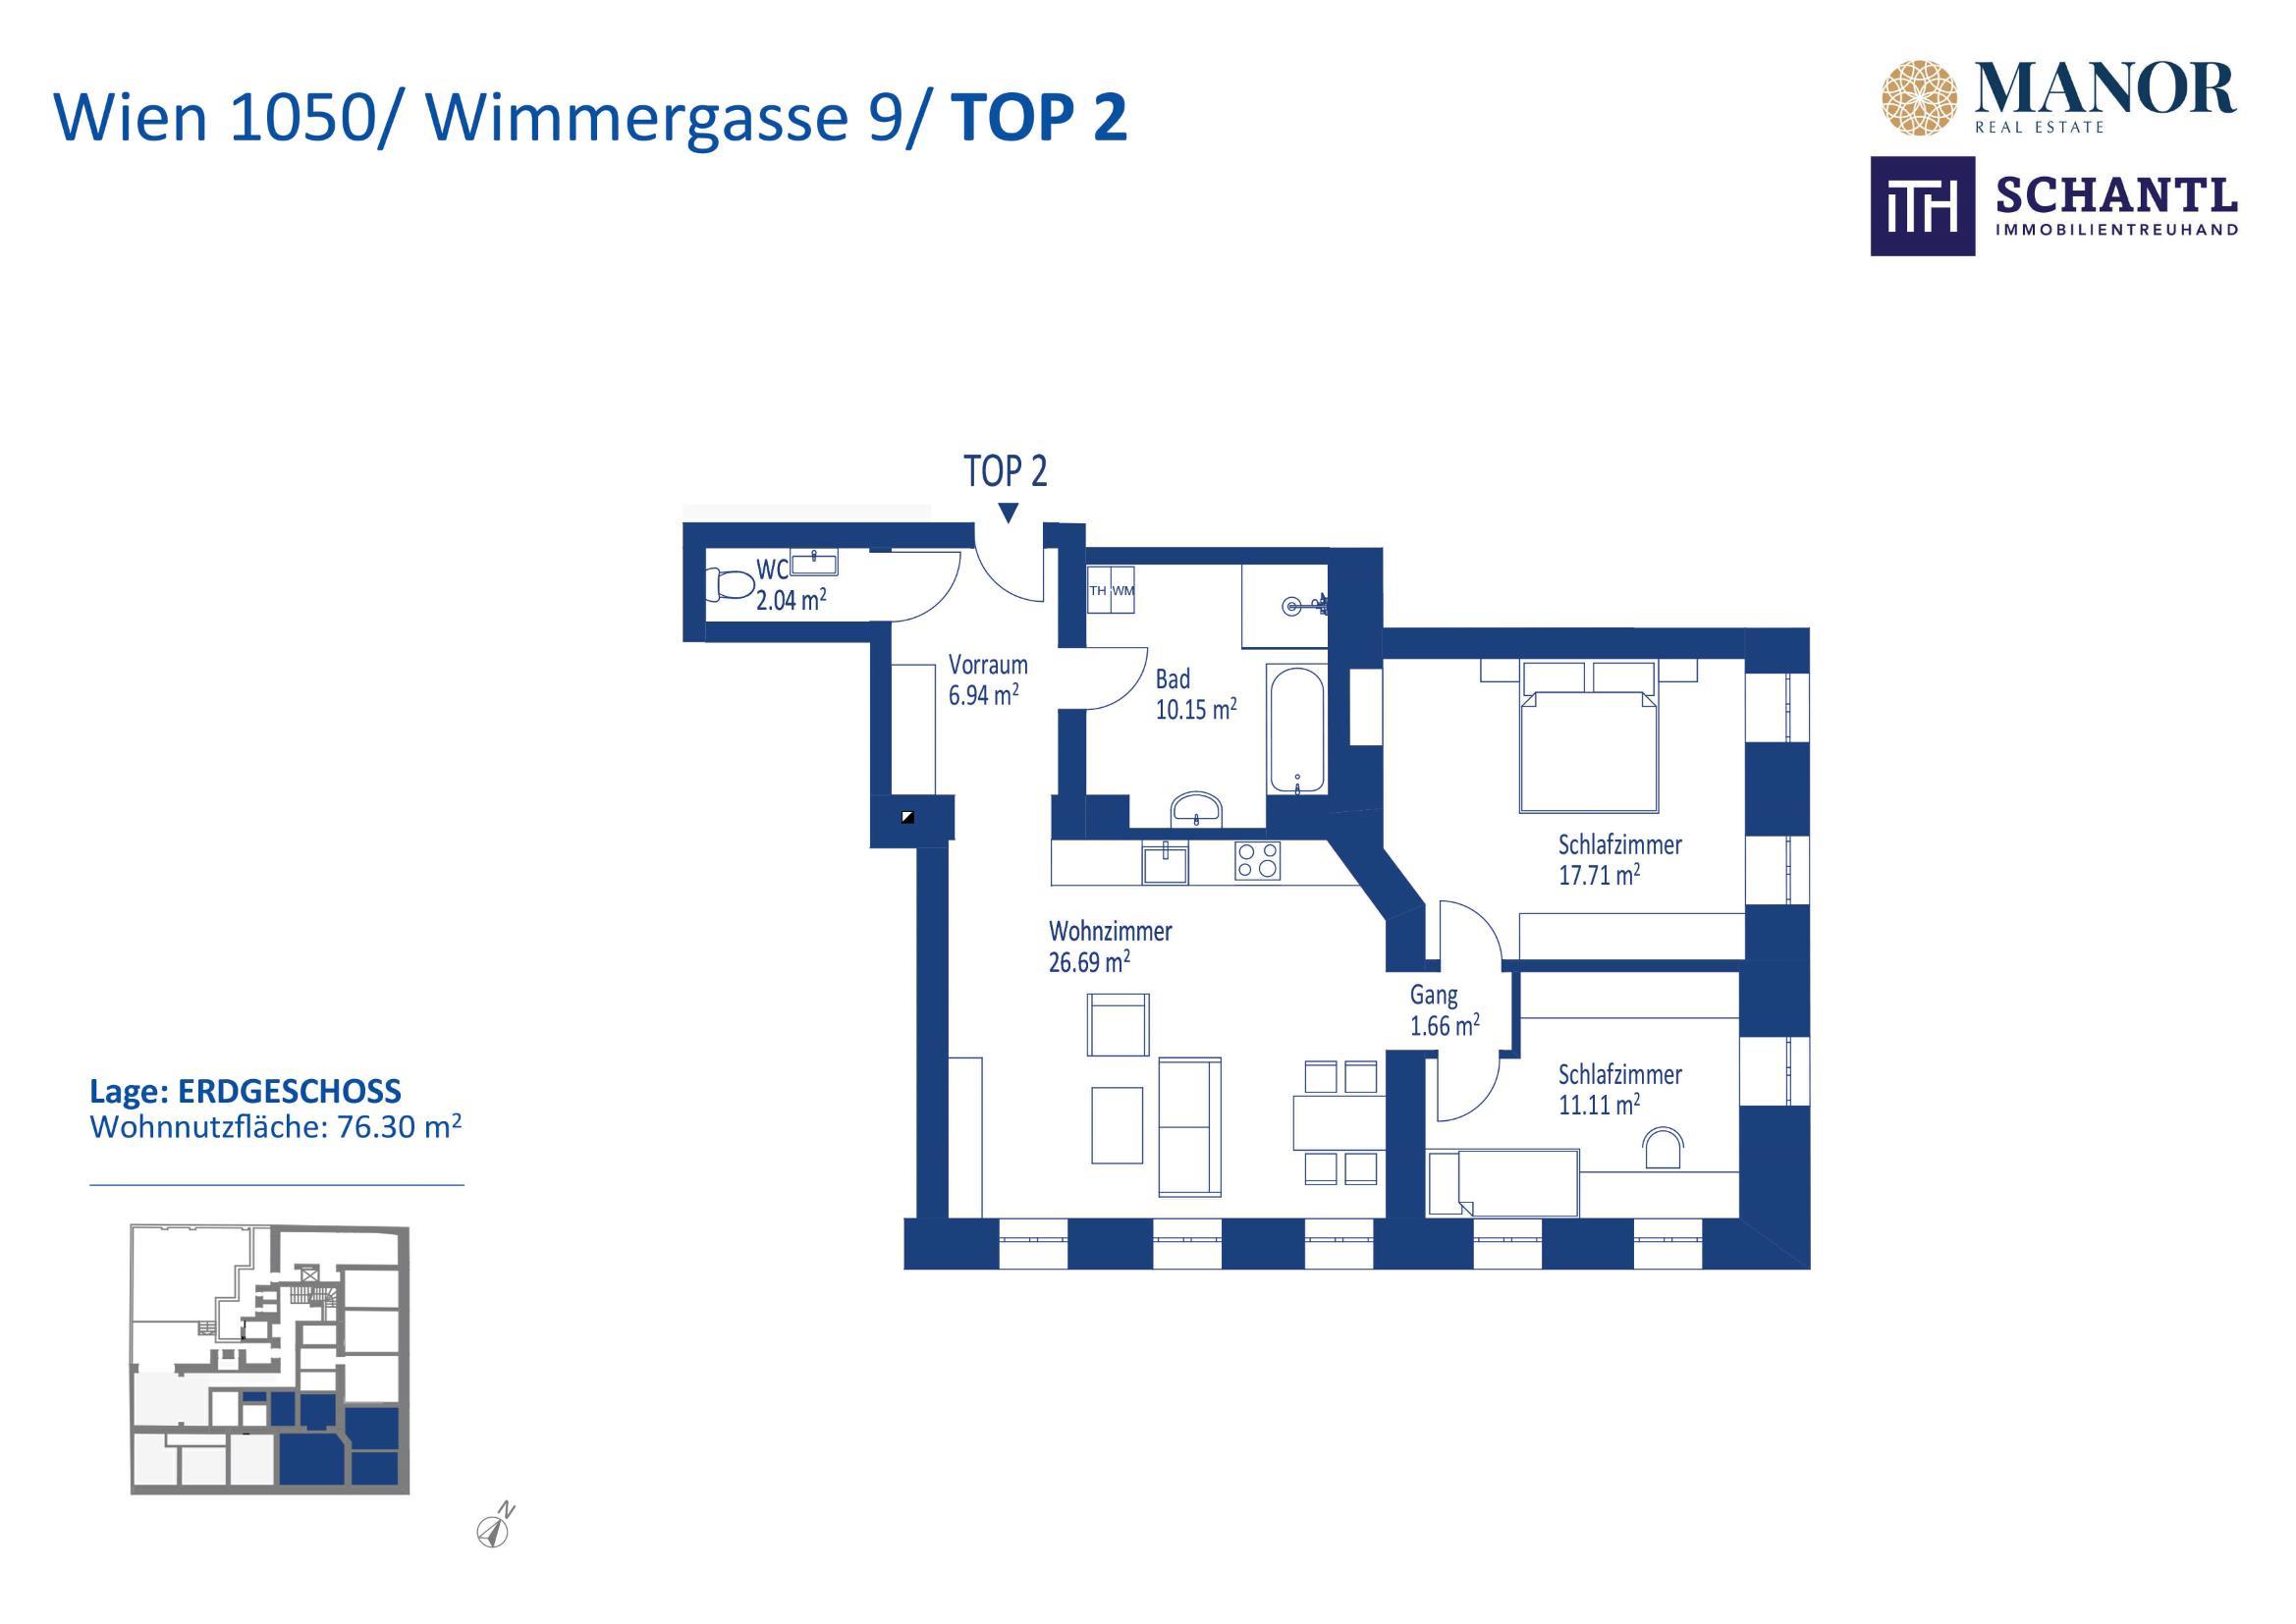 Wien 1050_Wimmergasse 9_TOP 2